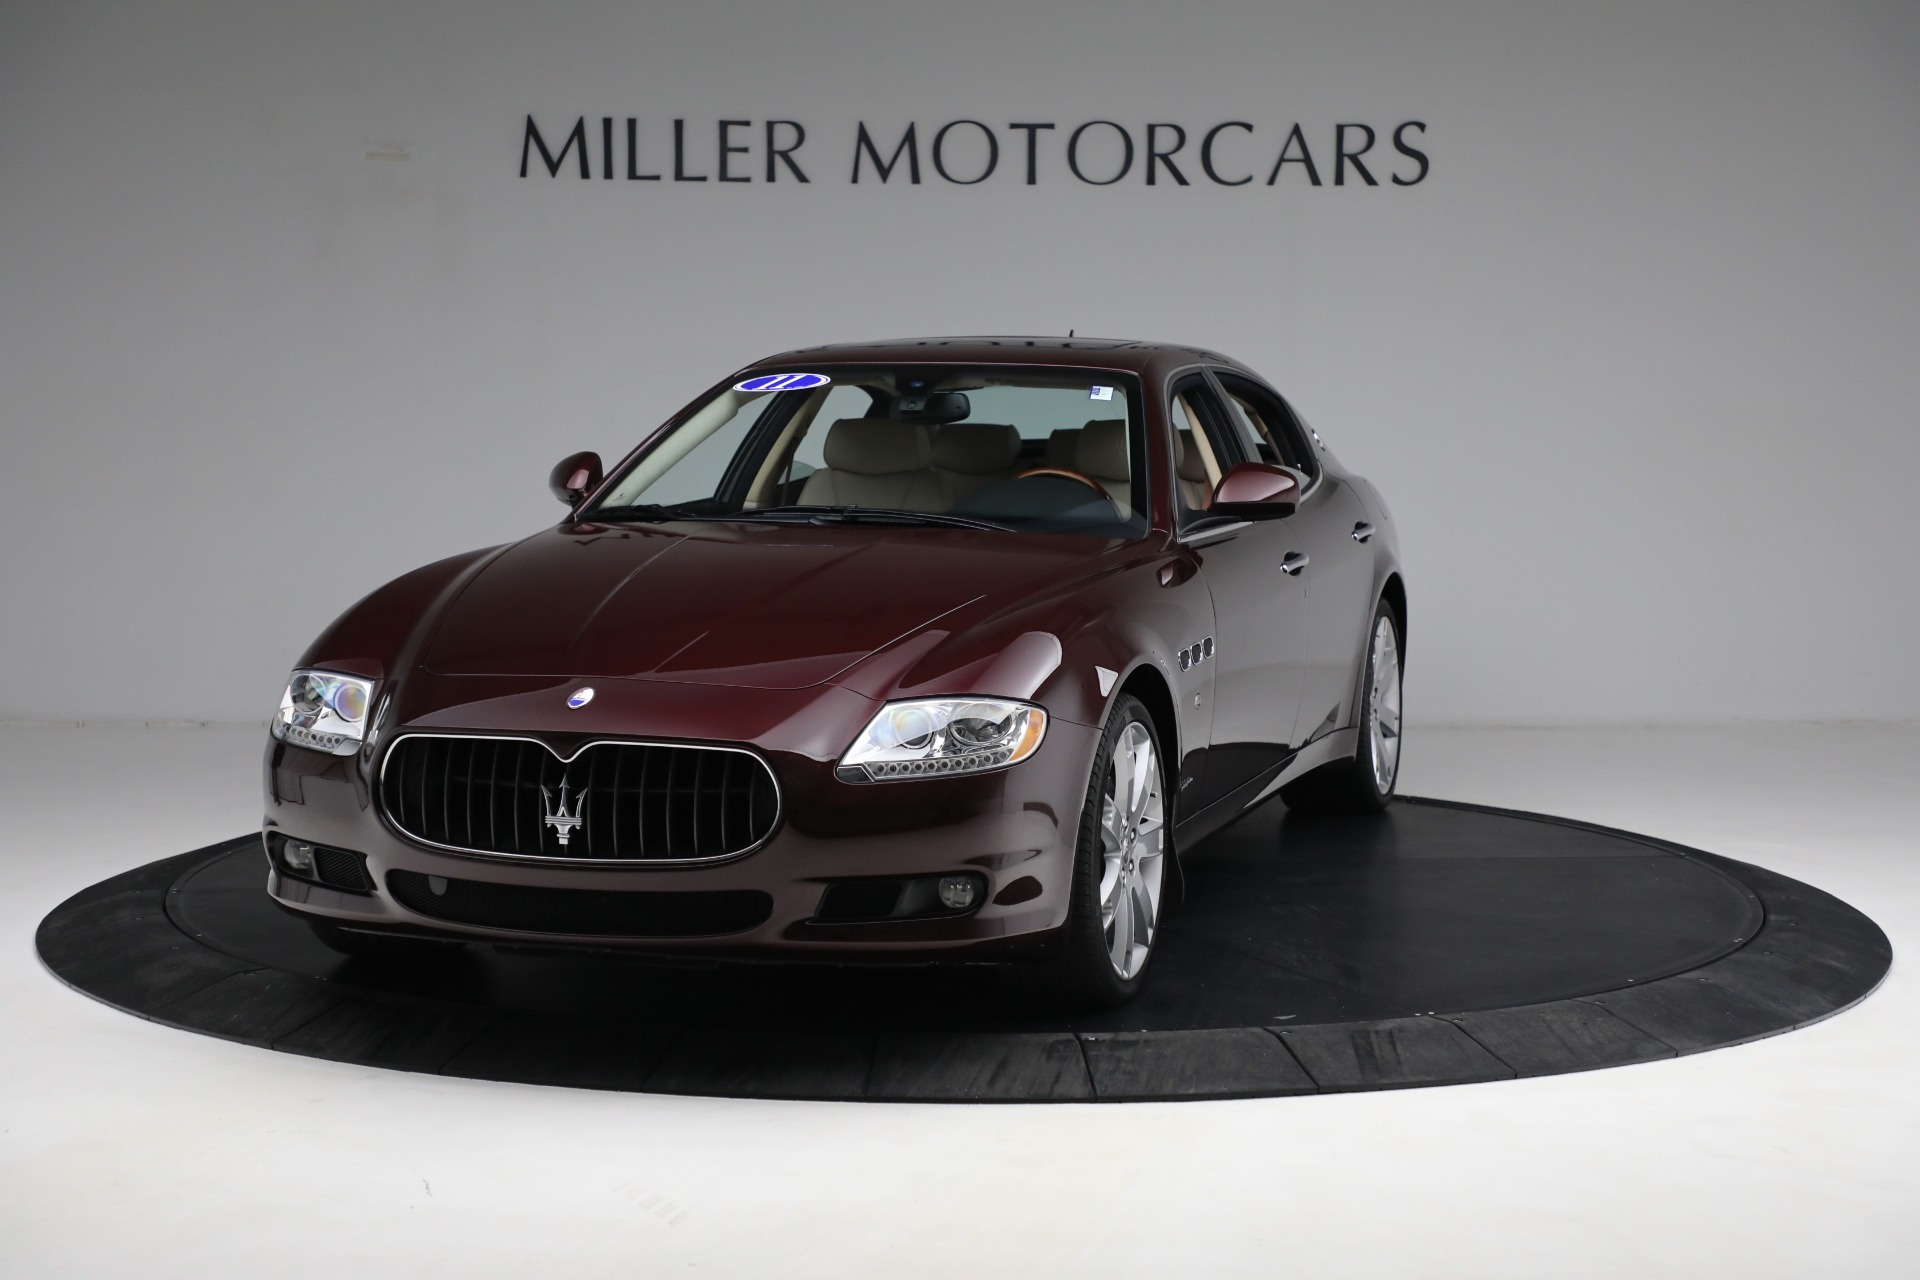 Used 2011 Maserati Quattroporte for sale Sold at Aston Martin of Greenwich in Greenwich CT 06830 1